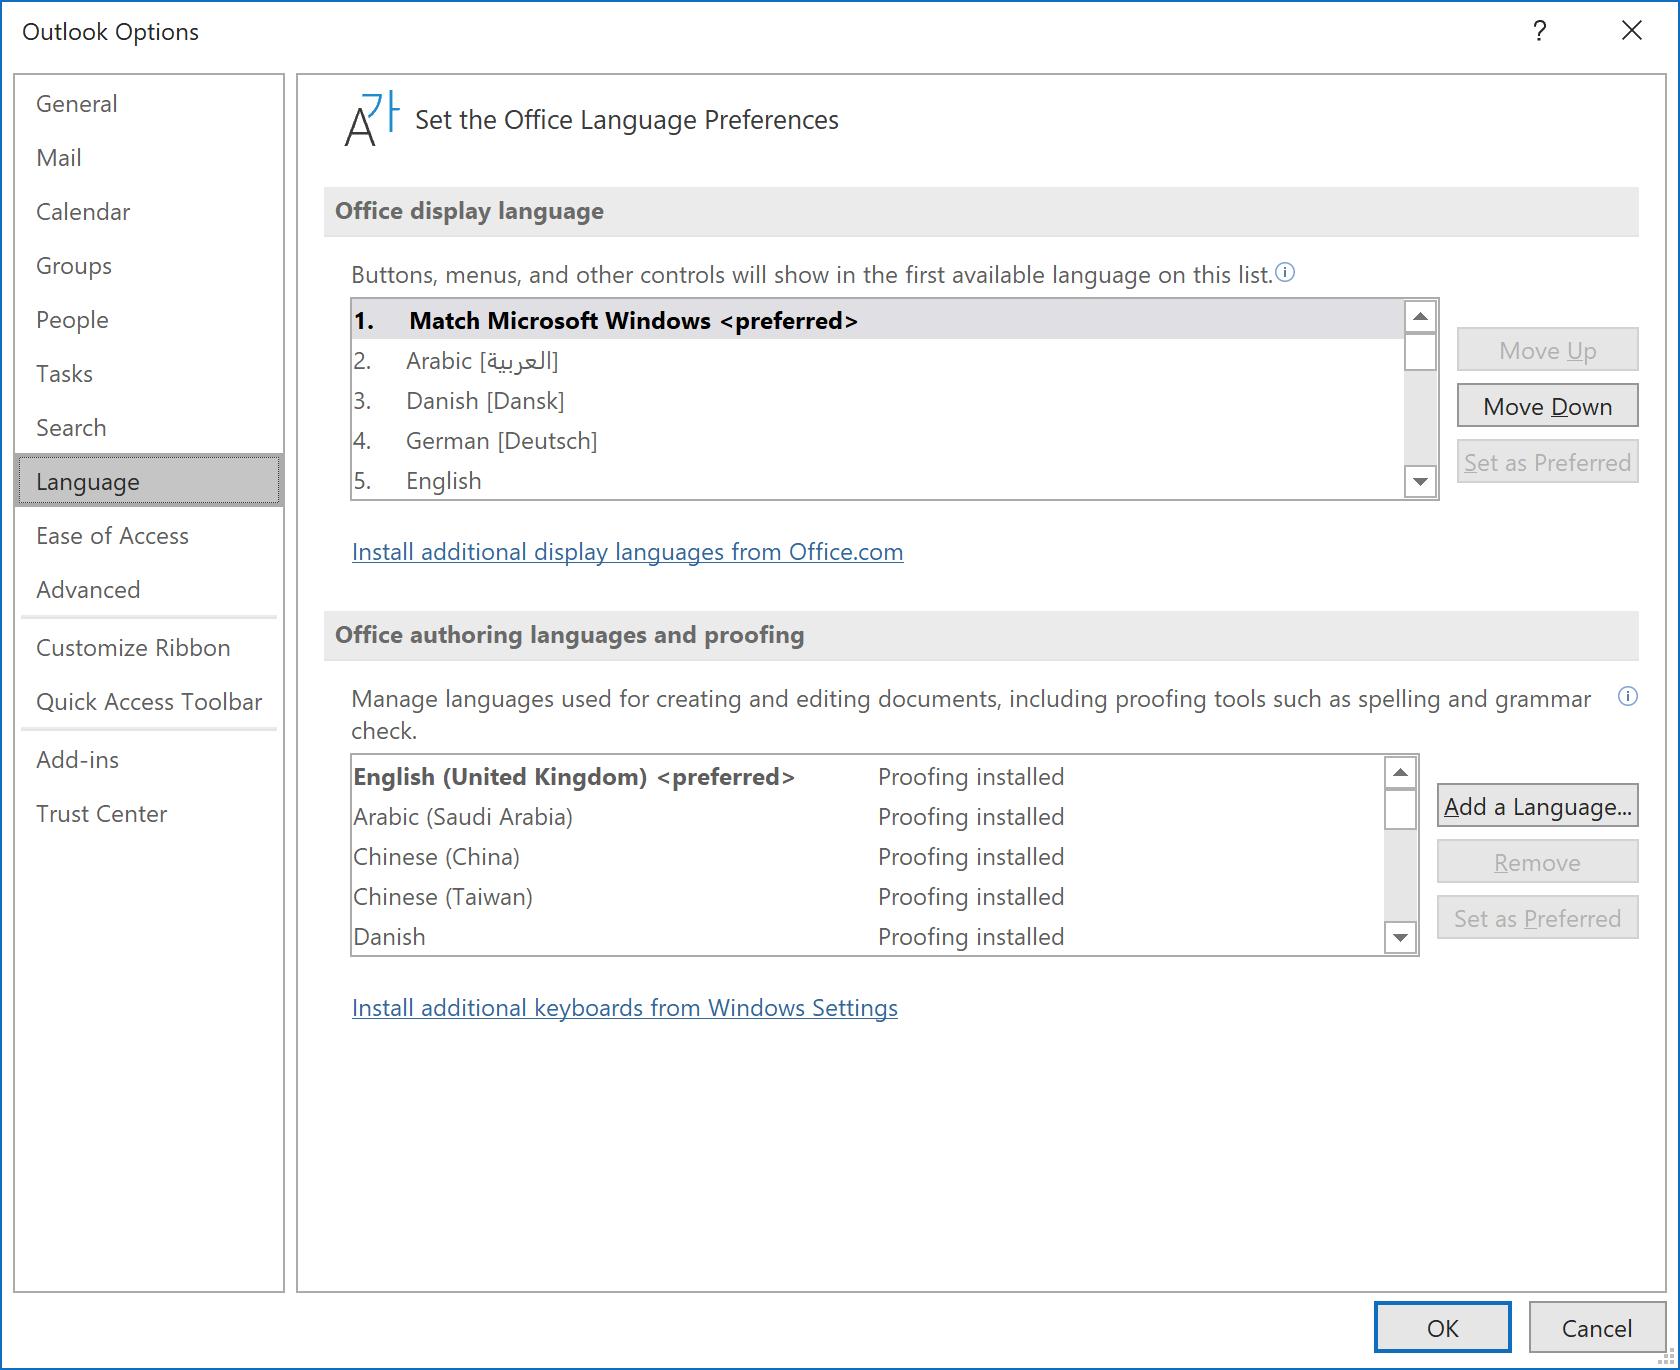 Office Language Preferences as originally set